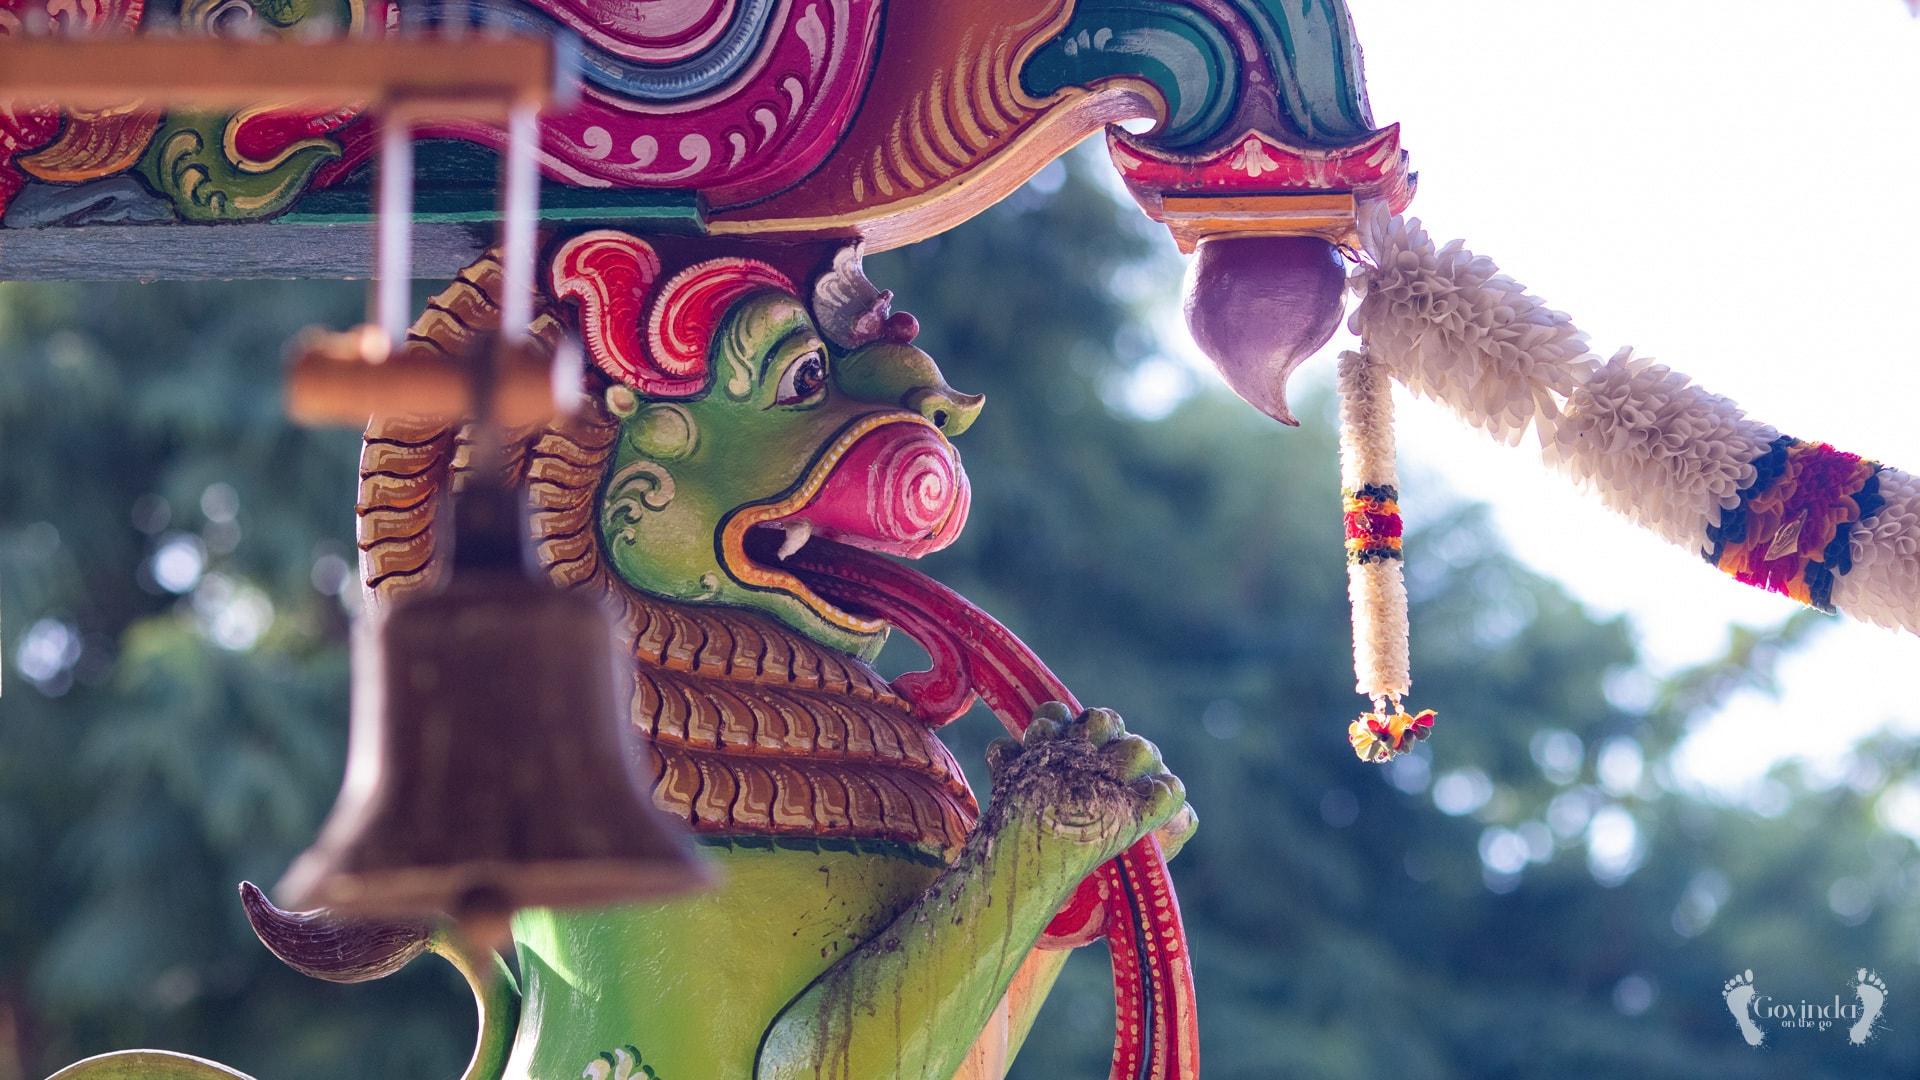 Lion ornaments in Parashakti Peetha temple in Mauritius